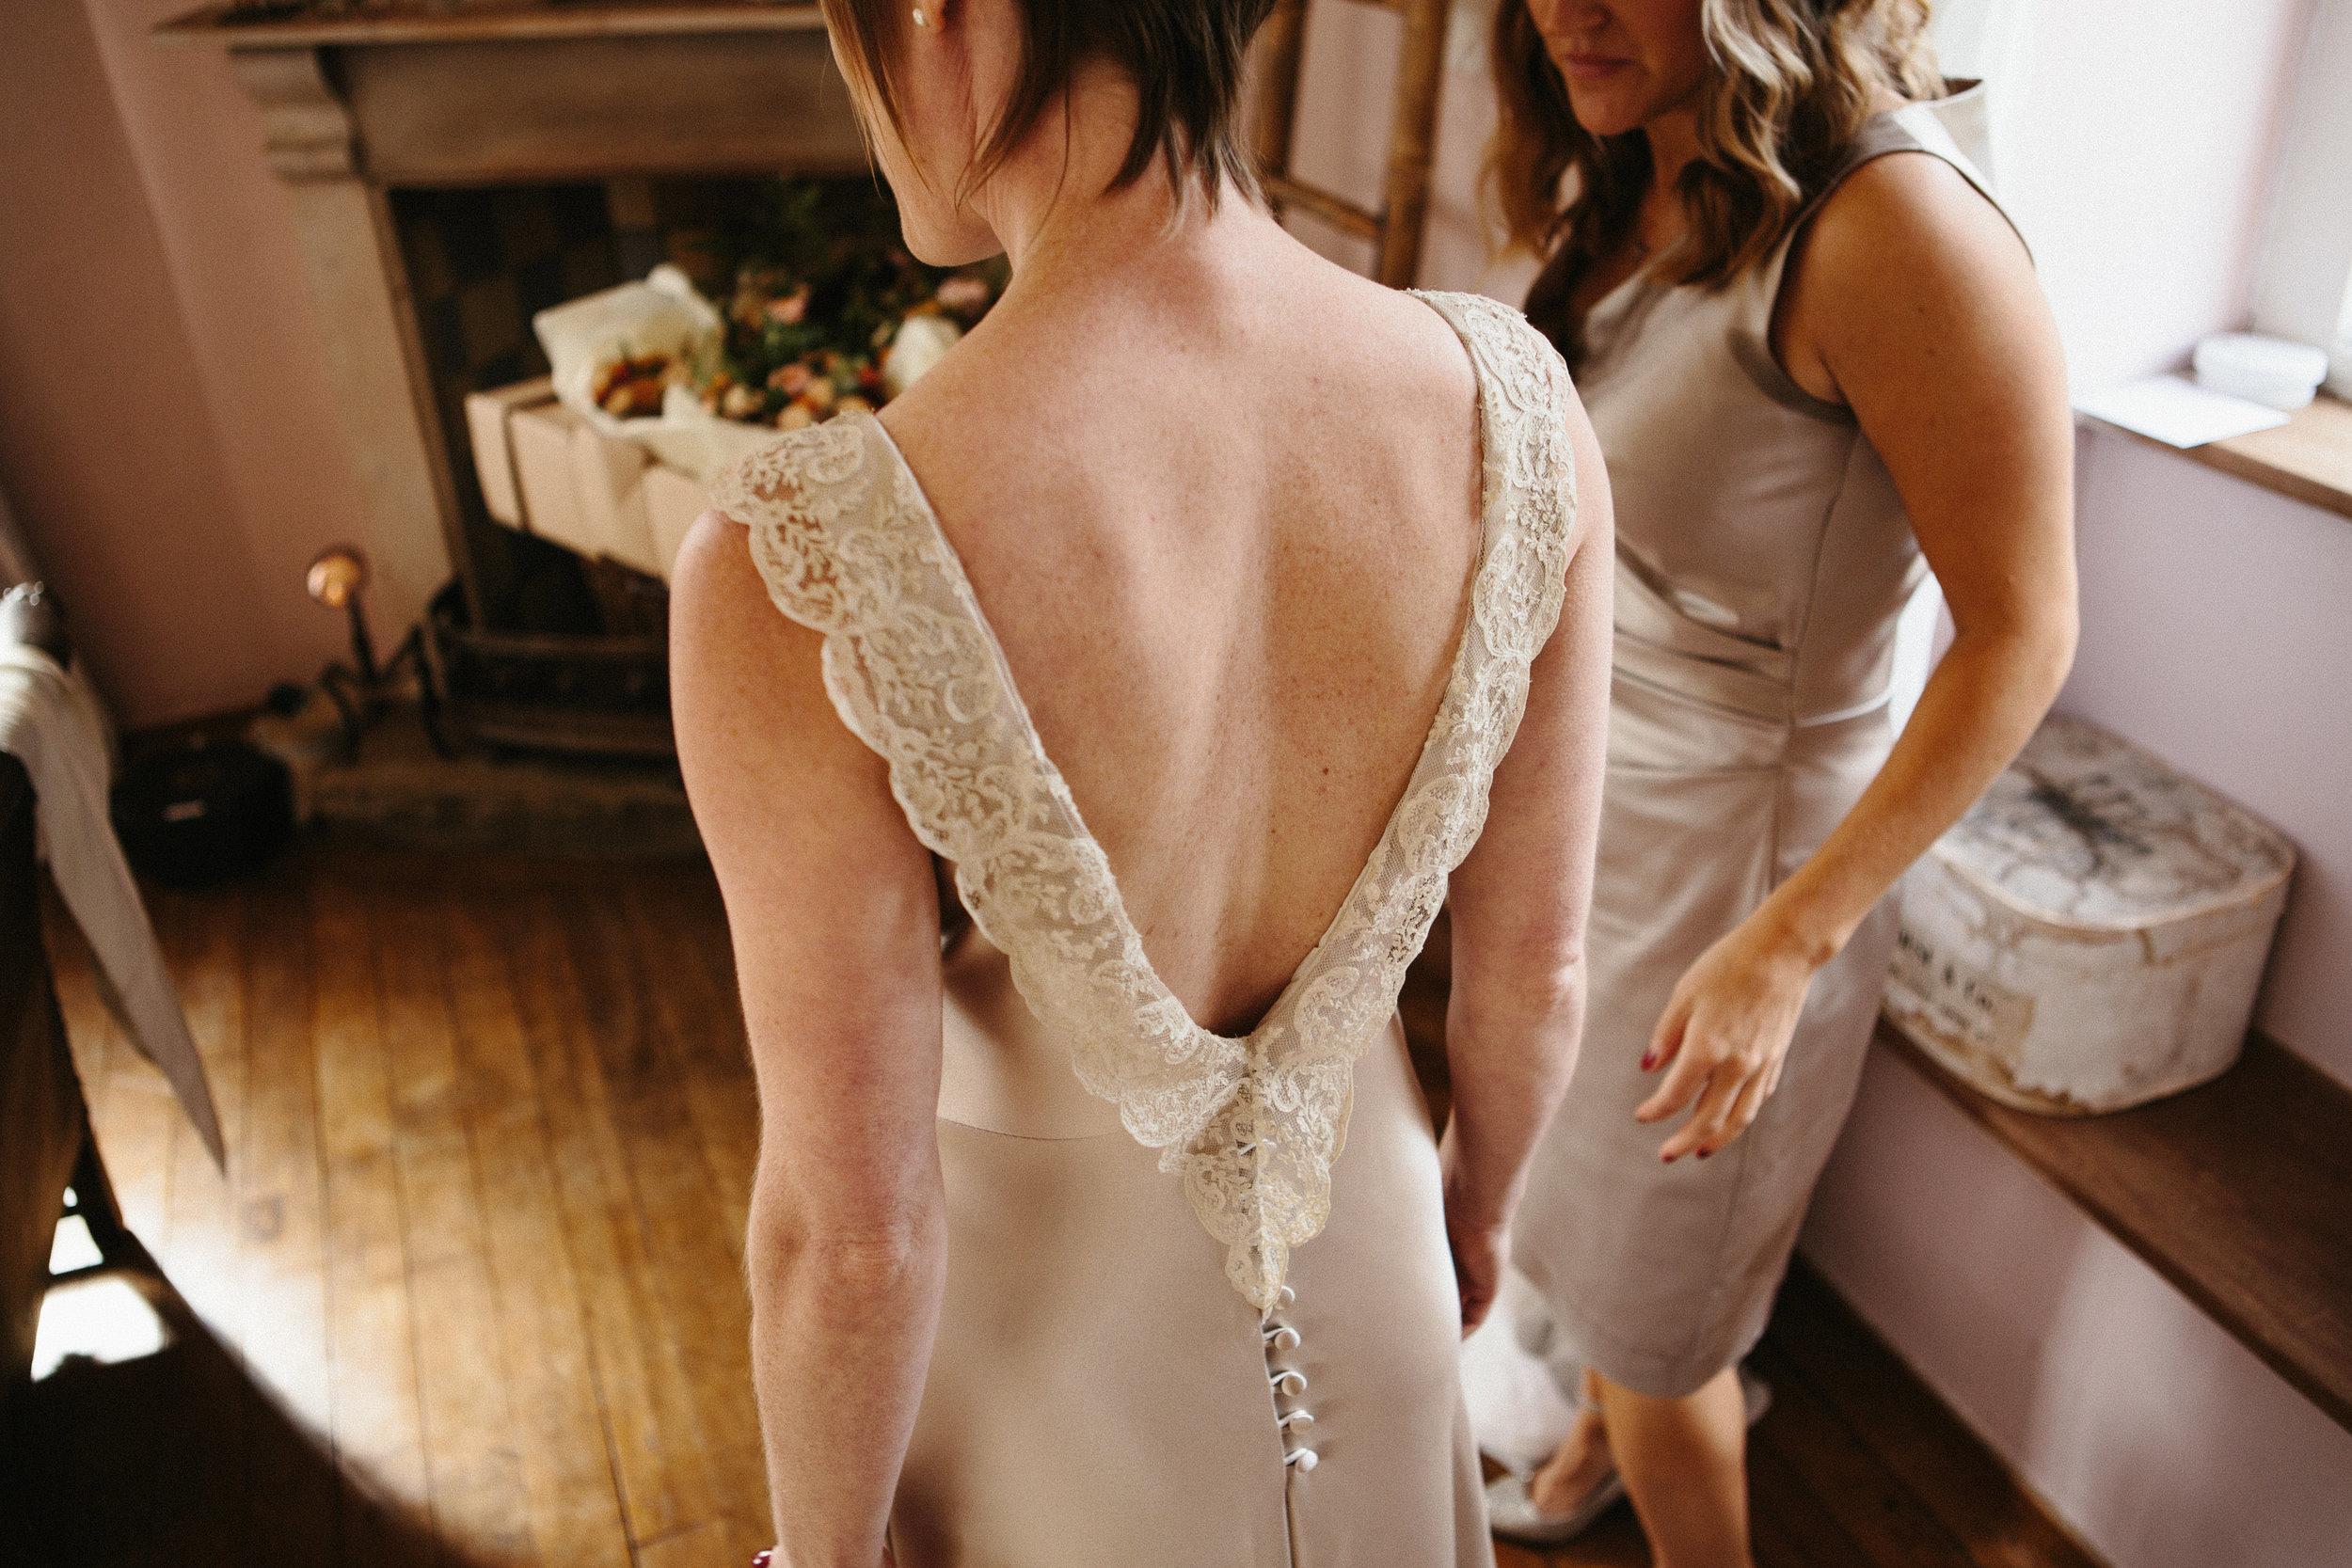 Kate-Beaumont-Sheffield-Honeysuckle-bias-cut-wedding-dress-oyster-Rosie1.jpg